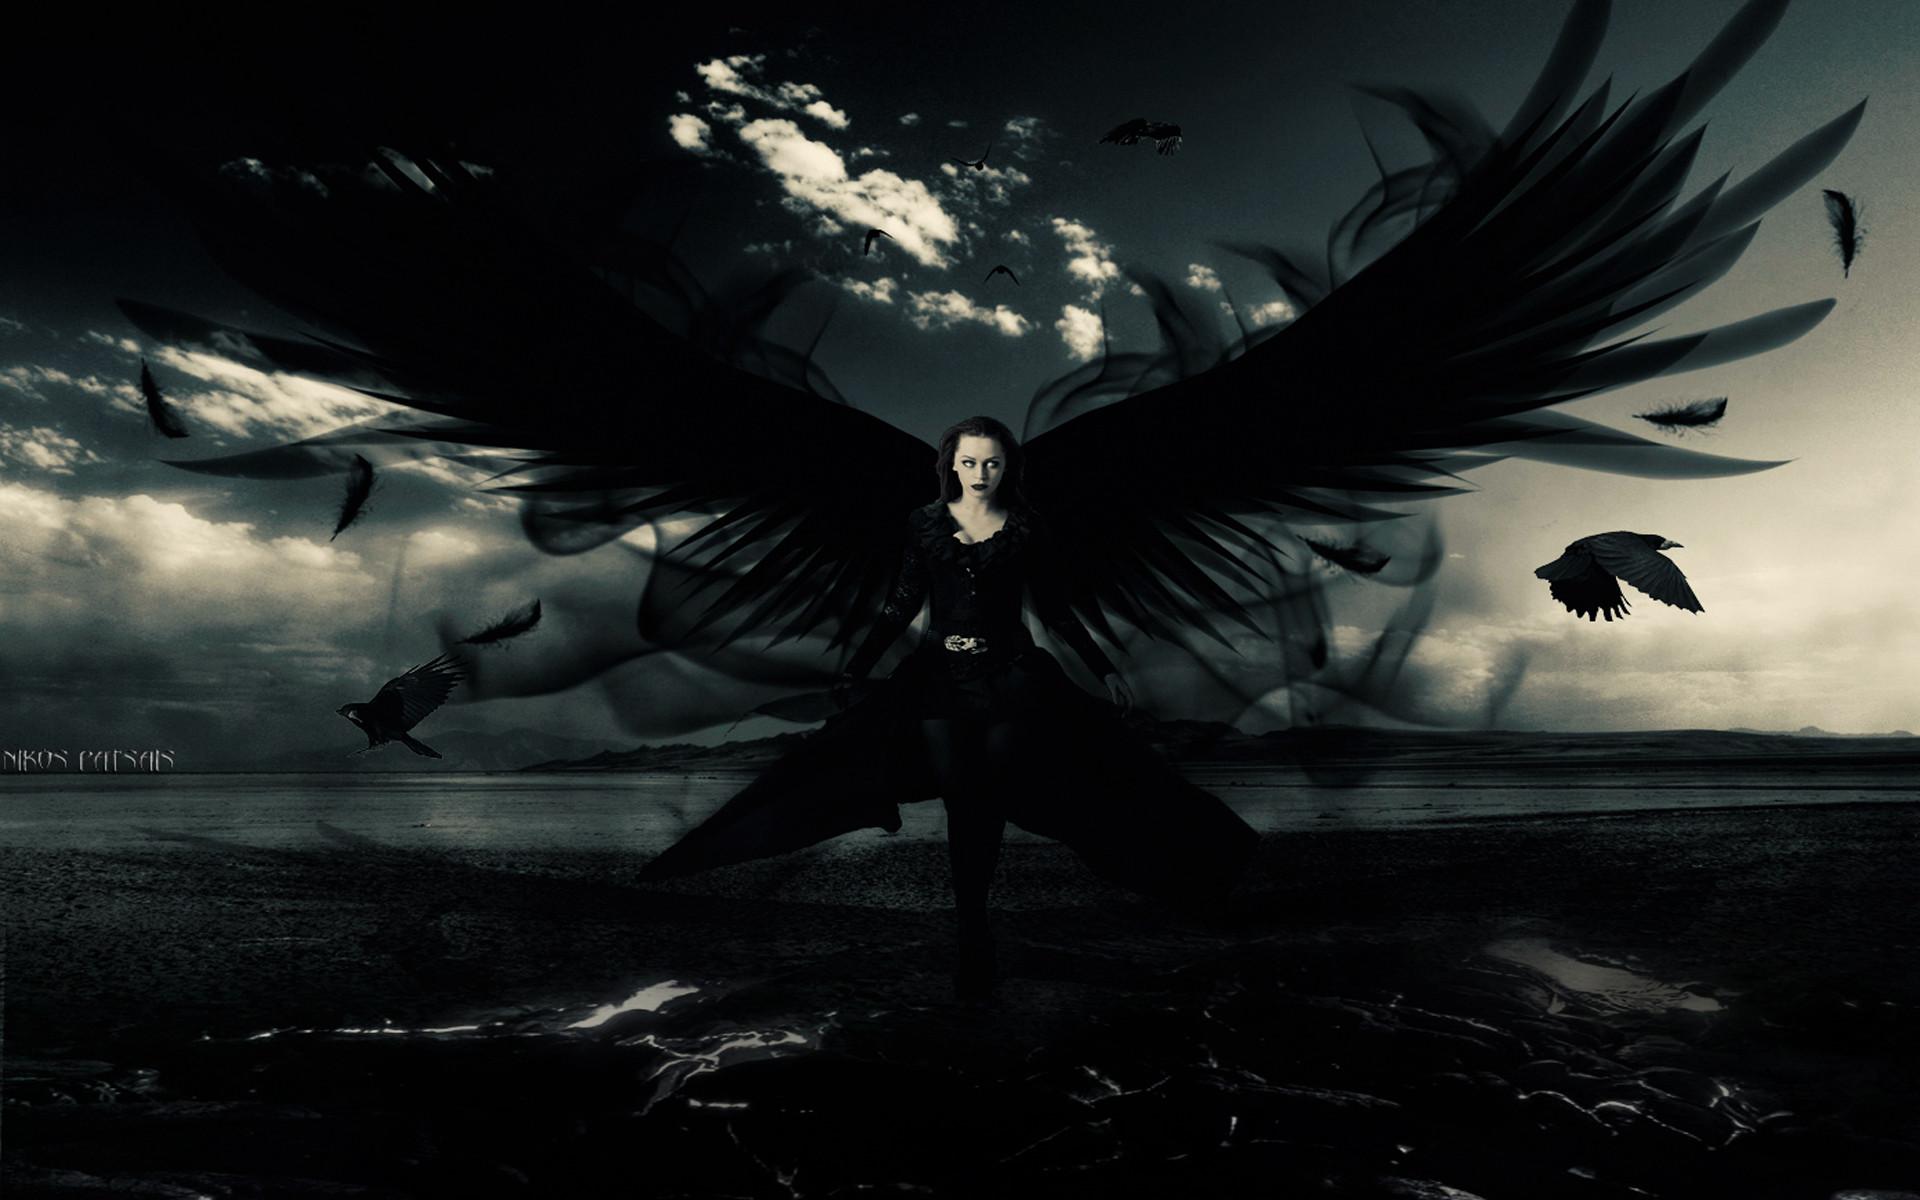 Res: 1920x1200, Previous: Dark angel ...